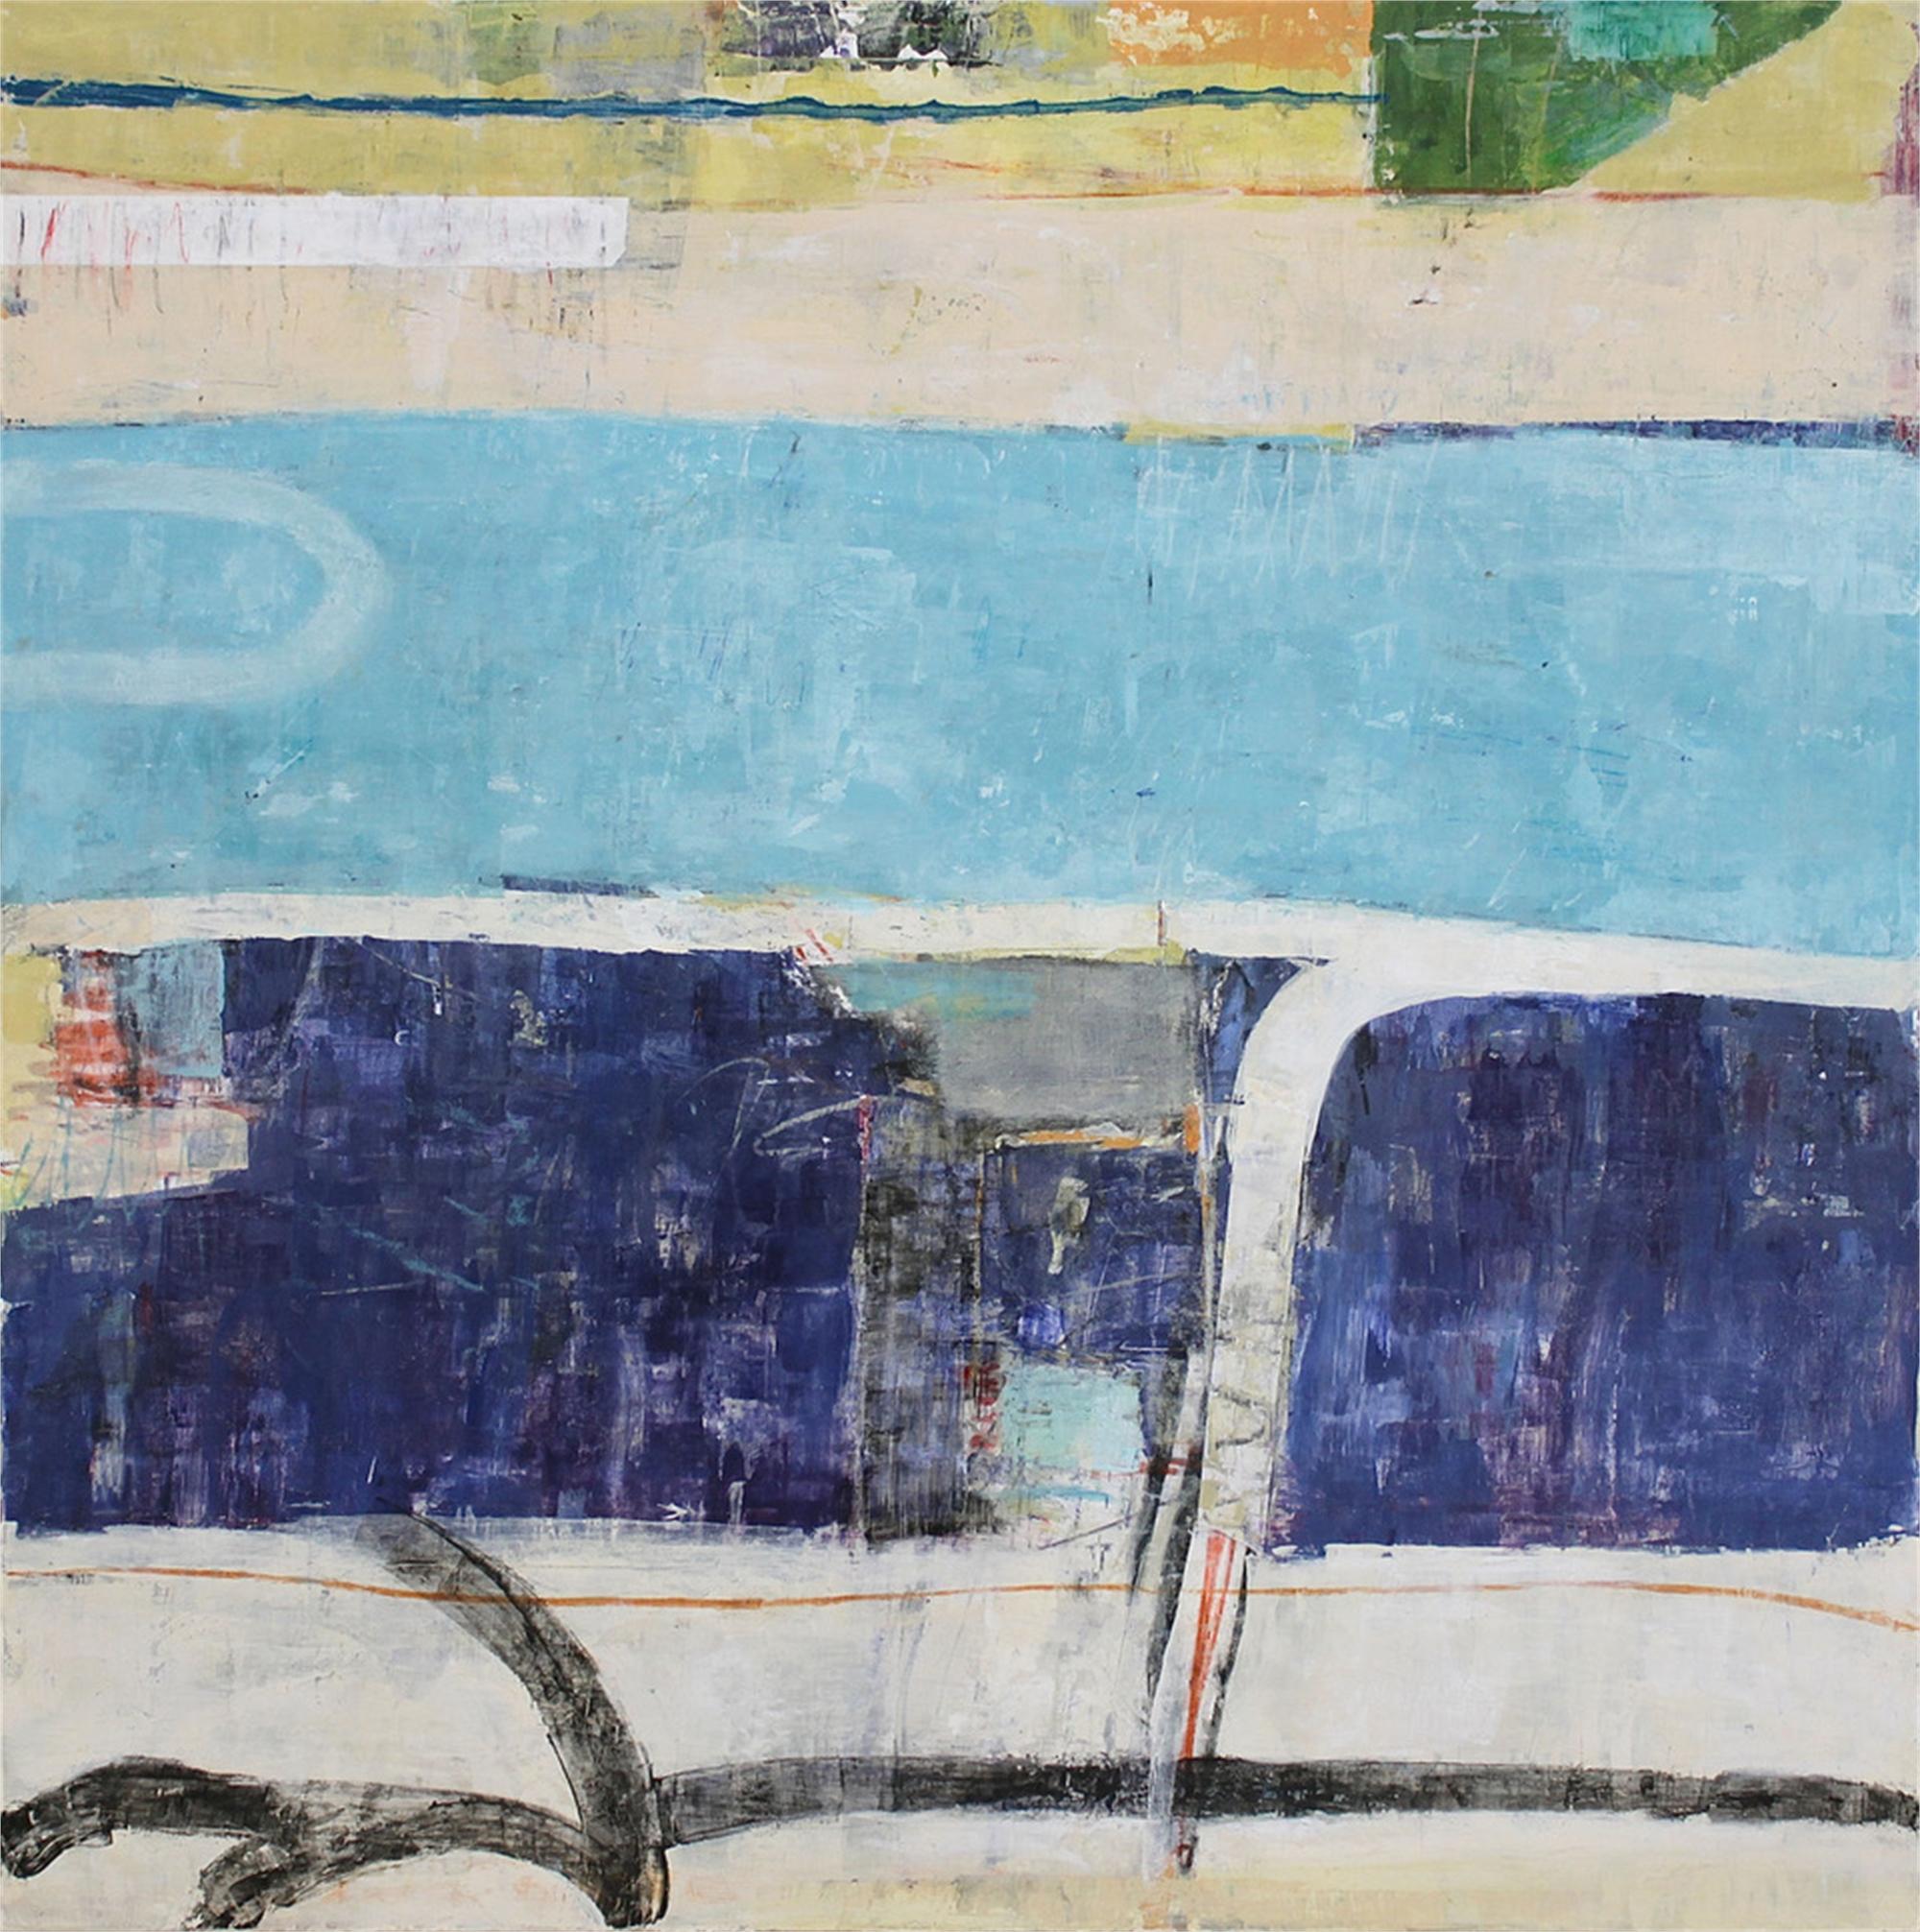 Tidal Pool by Paul Brigham